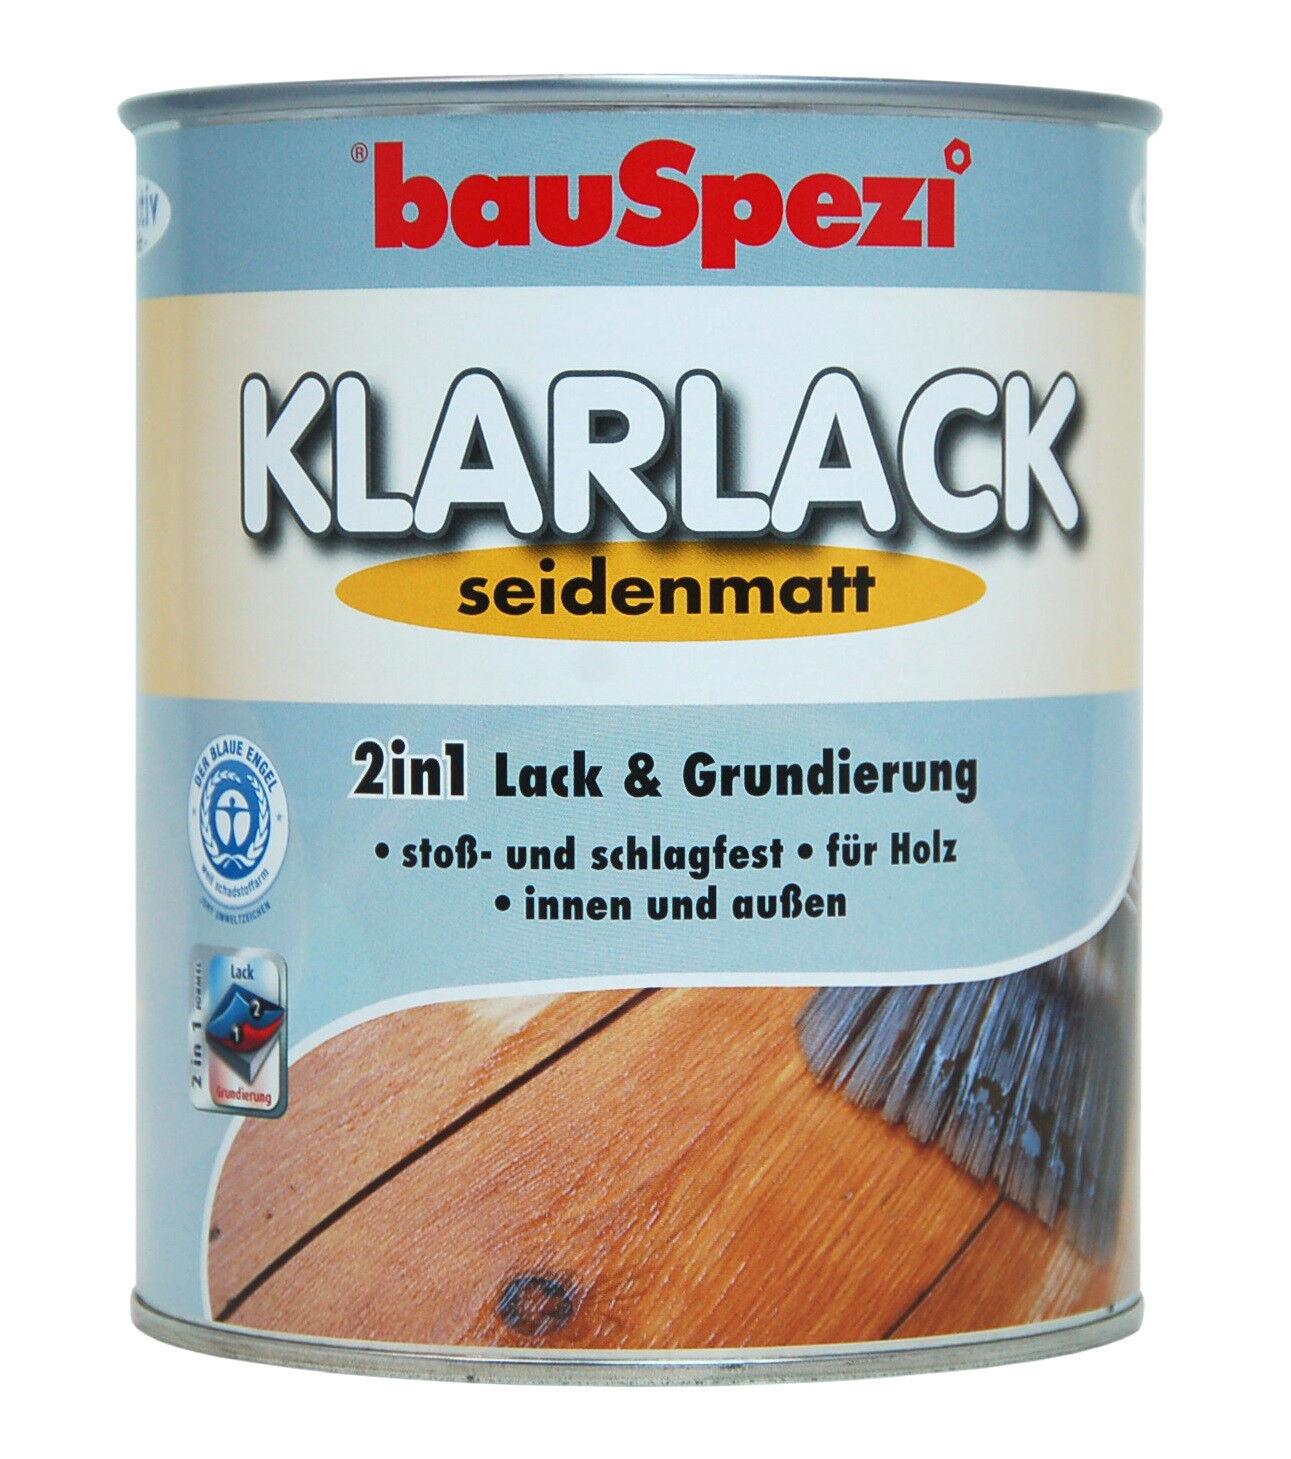 bauspezi 2in1 klarlack seidenmatt 750 ml farblose versiegelung holz